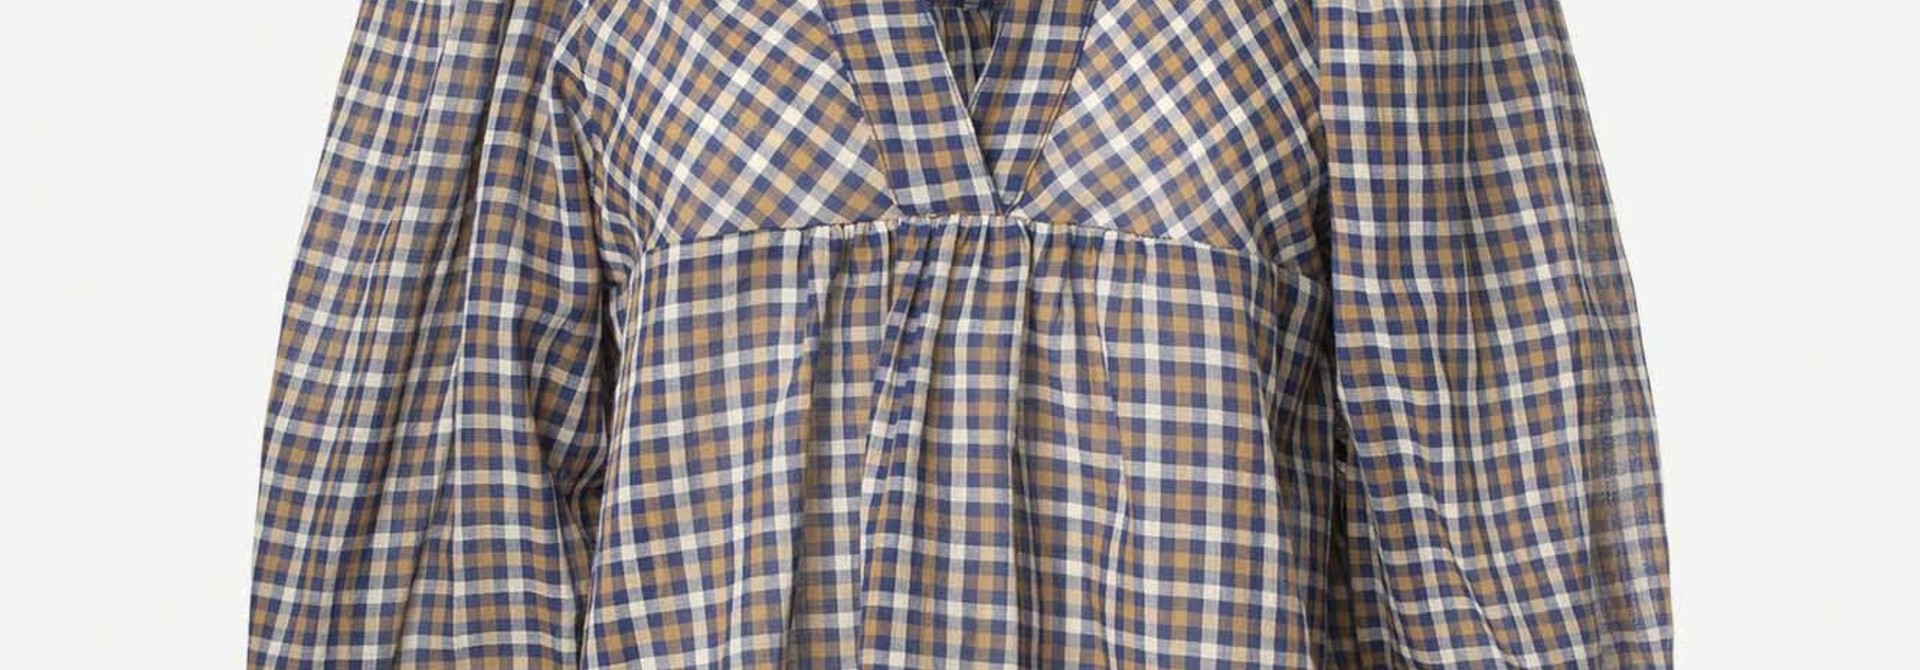 Opal shirt Samsoe